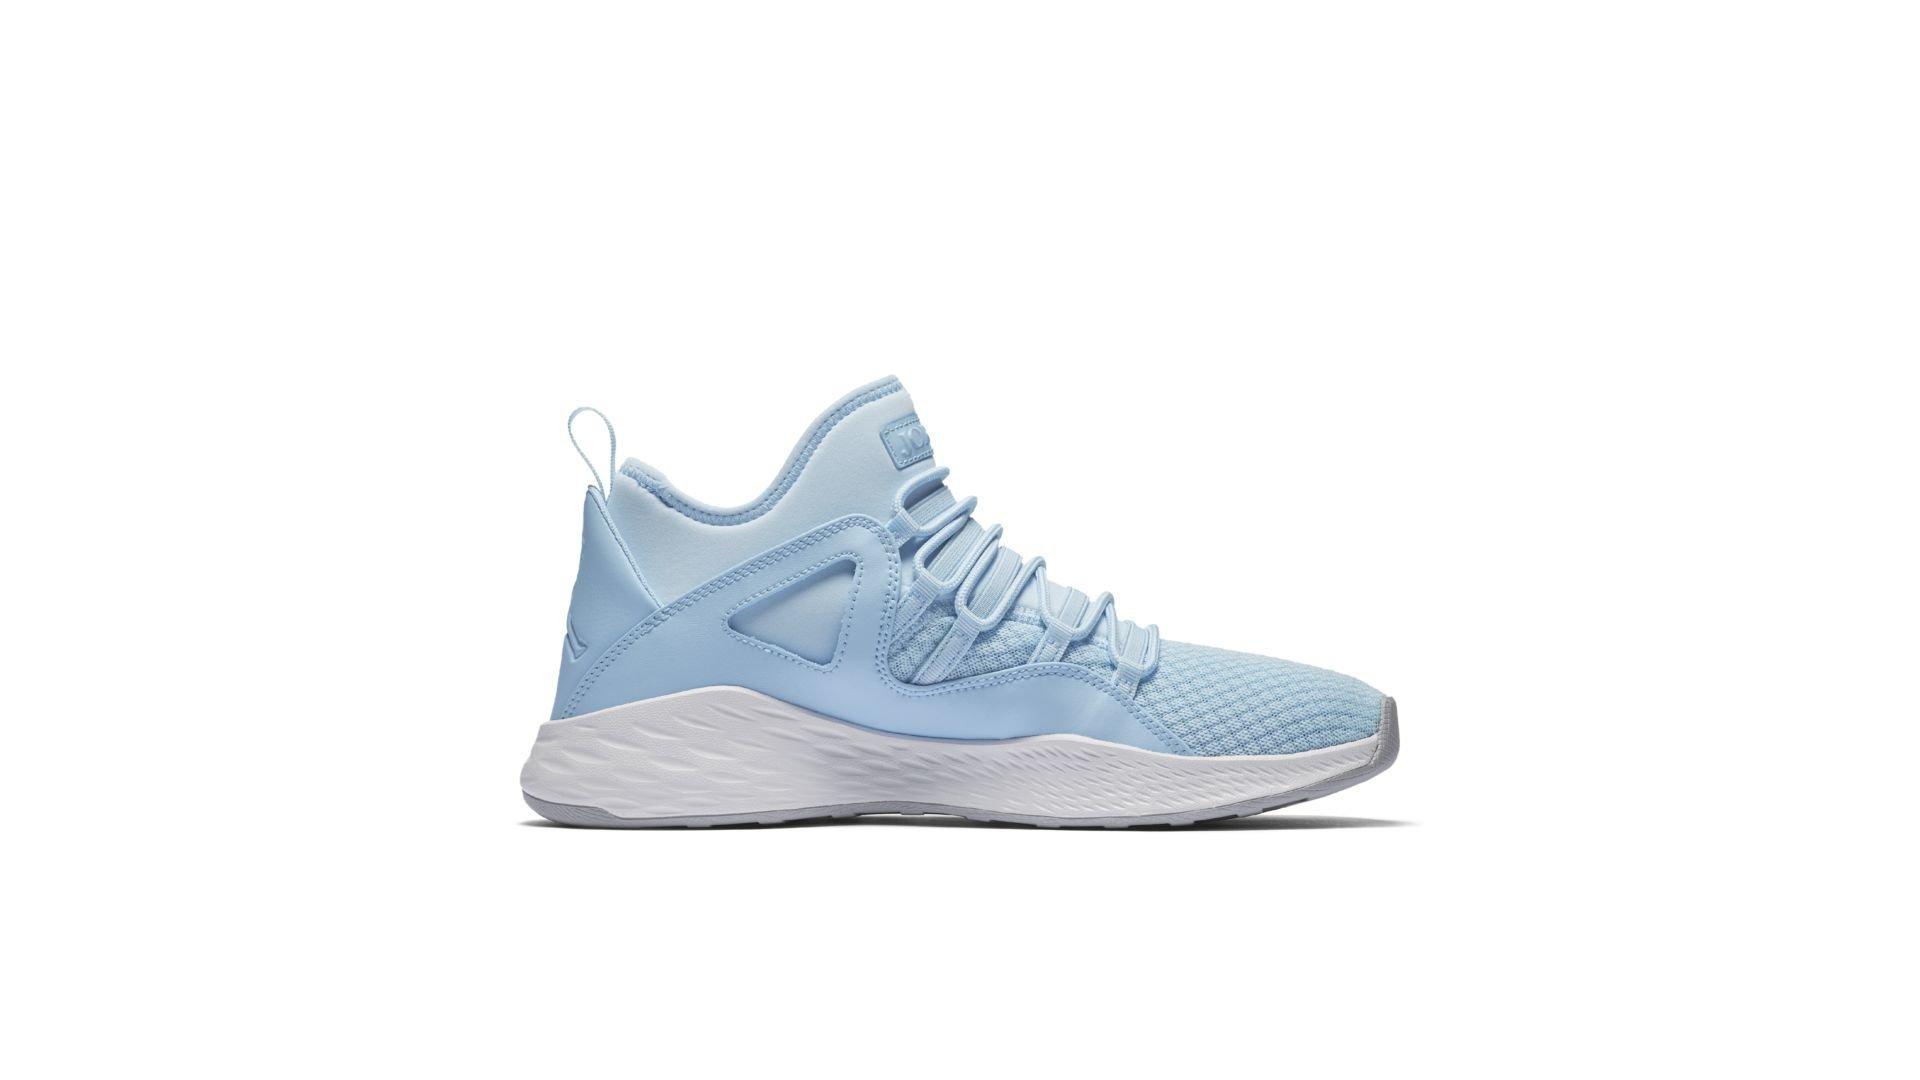 Jordan Formula 23 Ice Blue (881465-406)